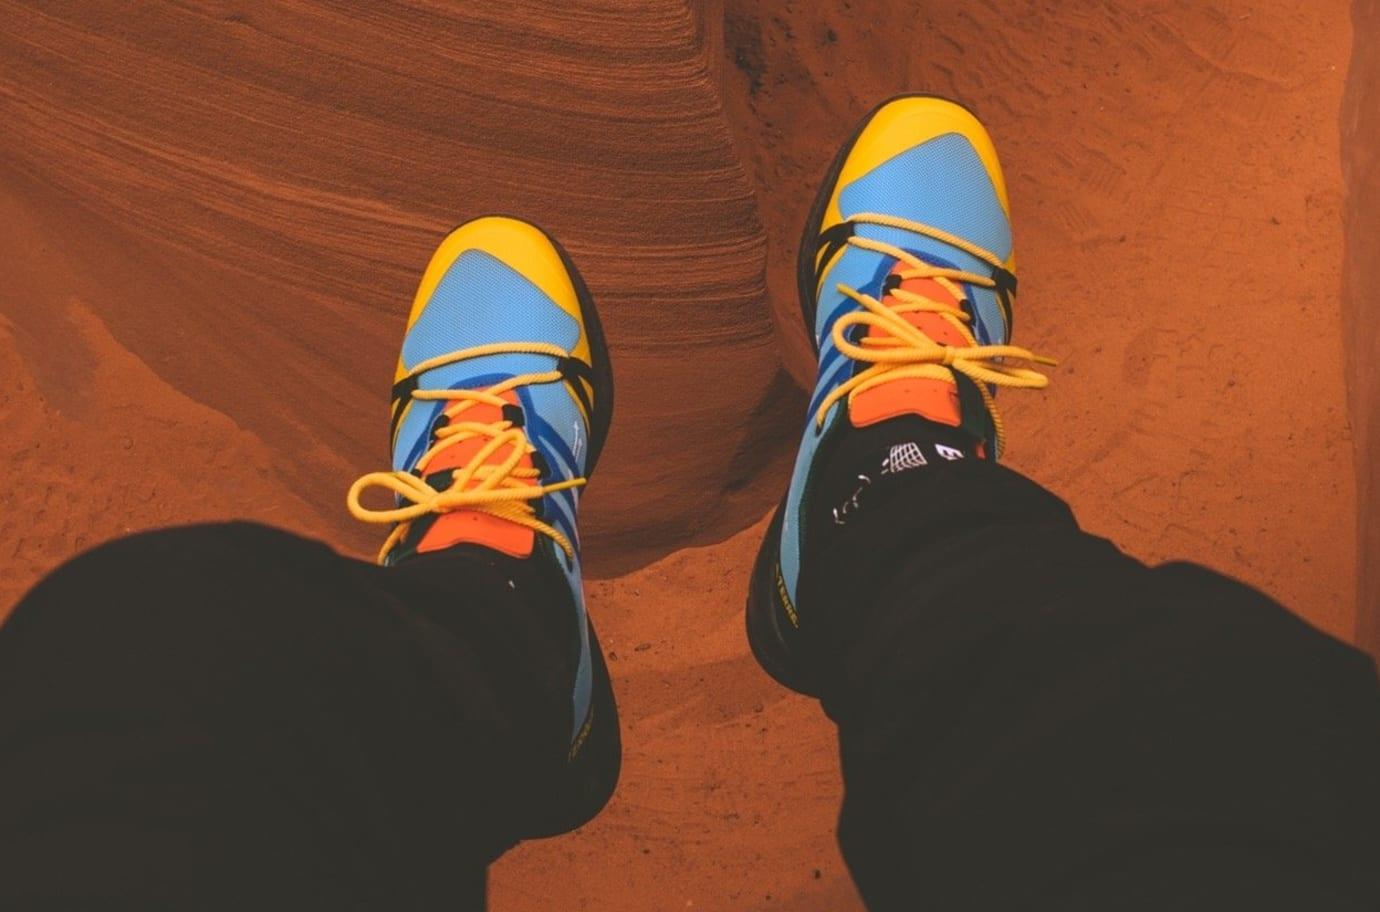 Kith x Adidas Terrex Agravic GTX (On-Foot)